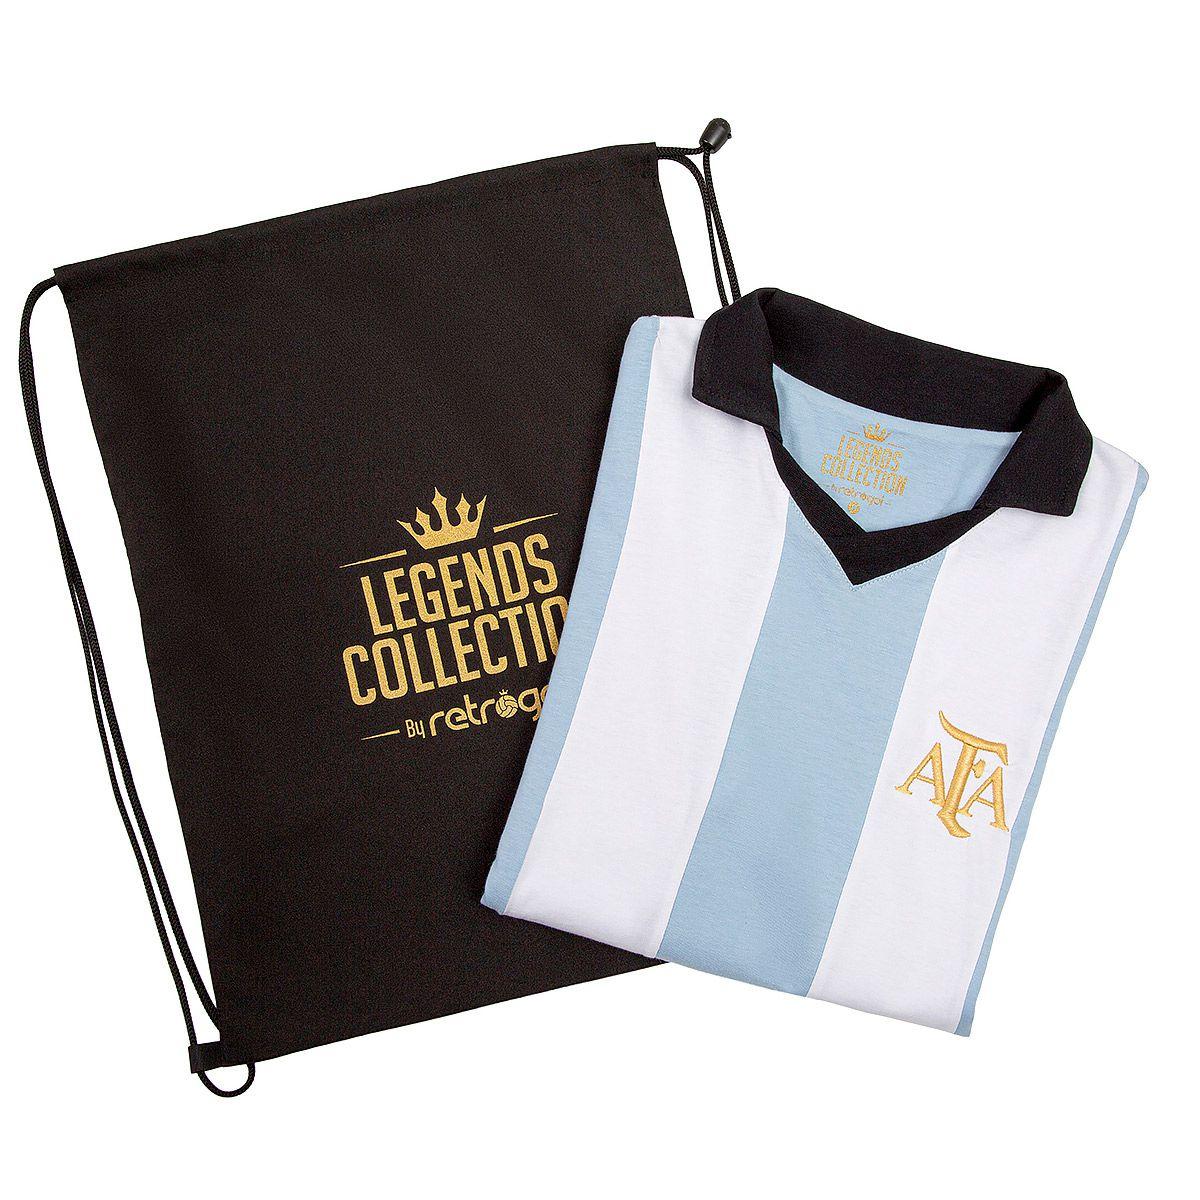 Camisa Argentina Retrô Legends Collection + Sacola